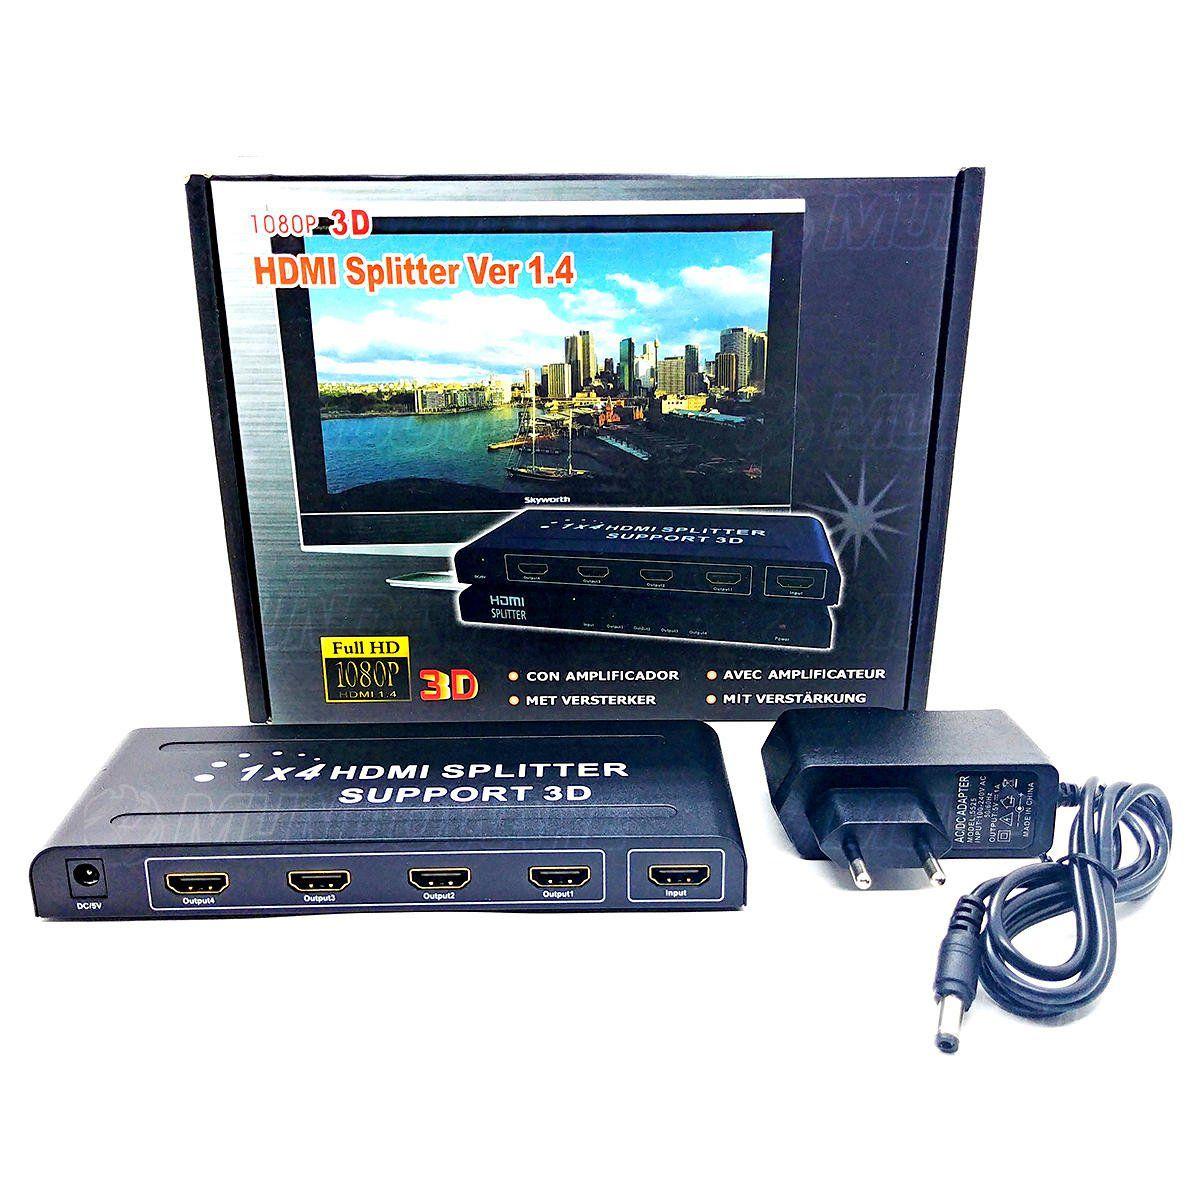 Splitter HDMI 1 Entrada x 4 Saidas 1080P 3D Versão 1.4 M501